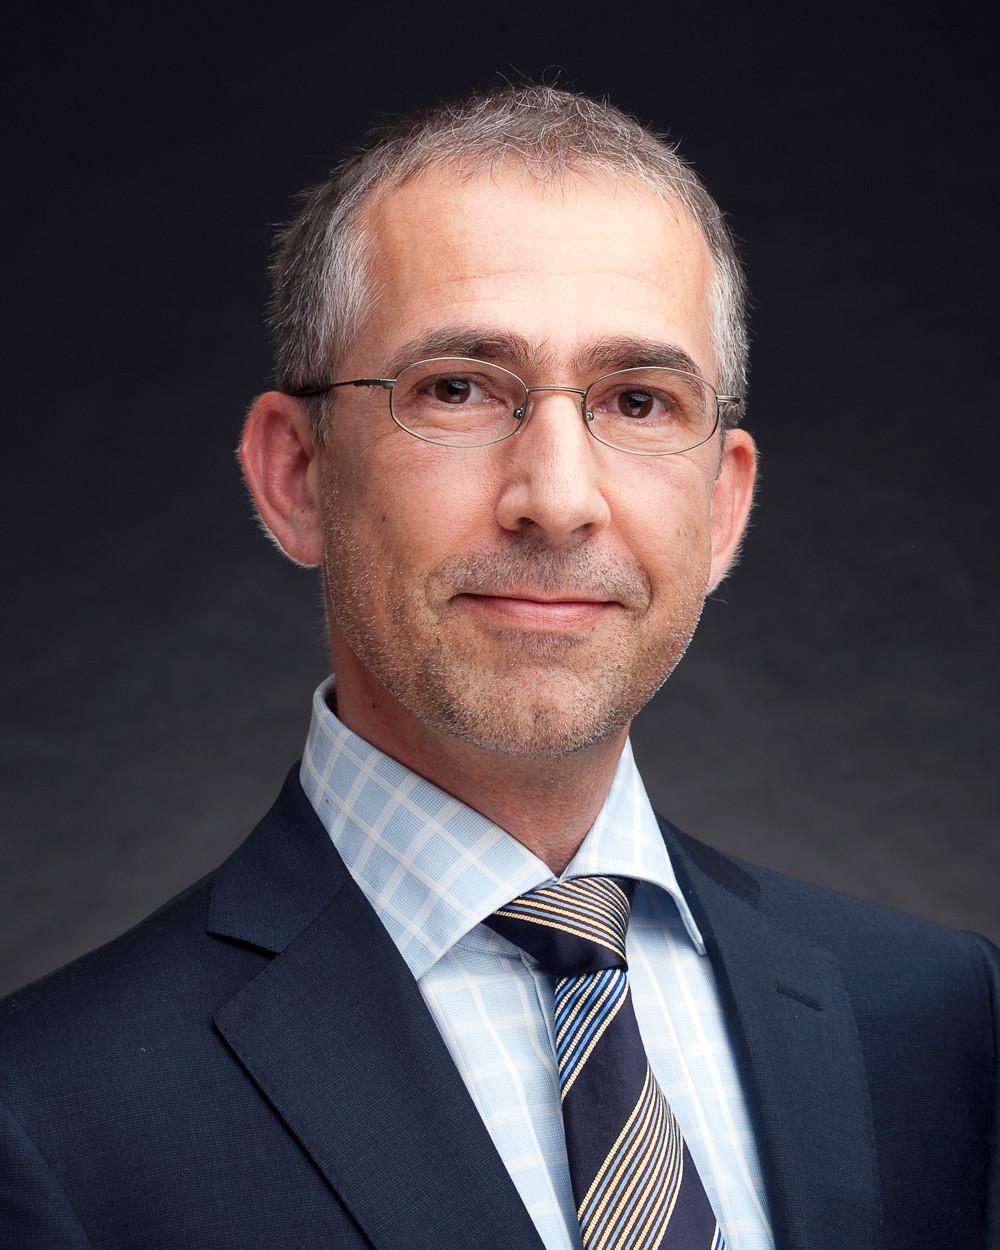 Michael Camenzind